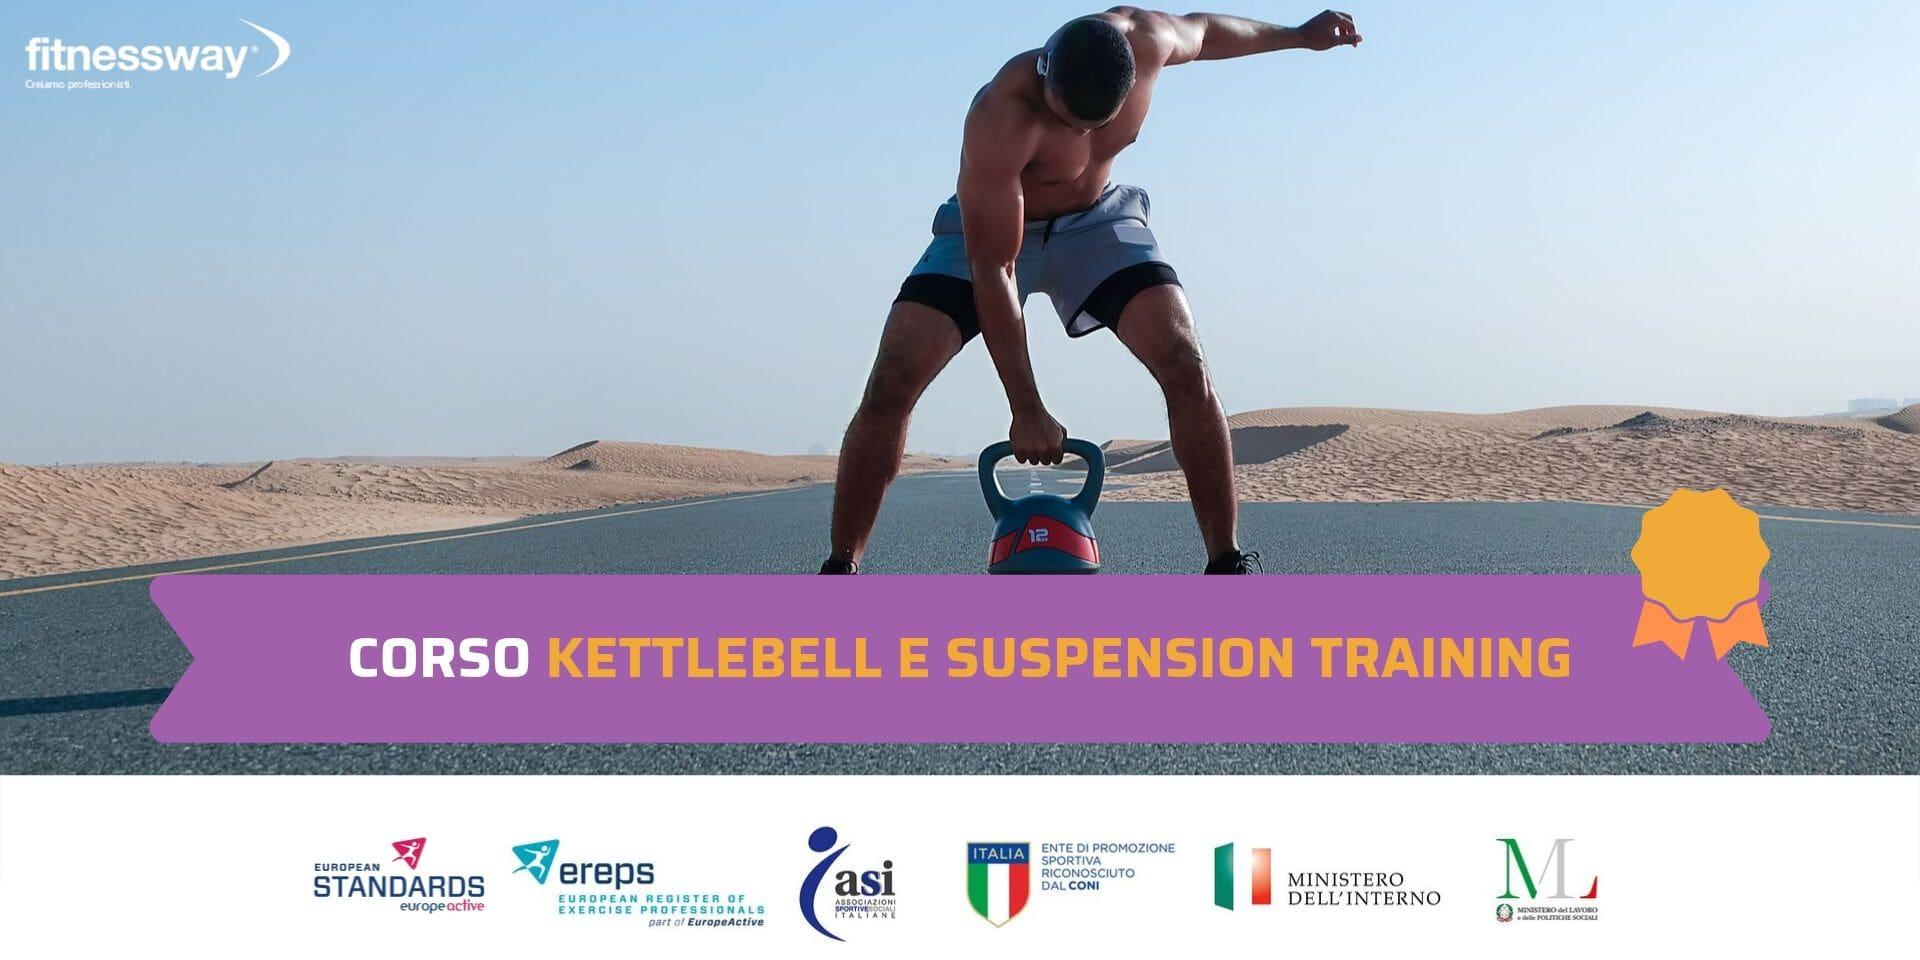 Corso Kettlebell e Suspension Training